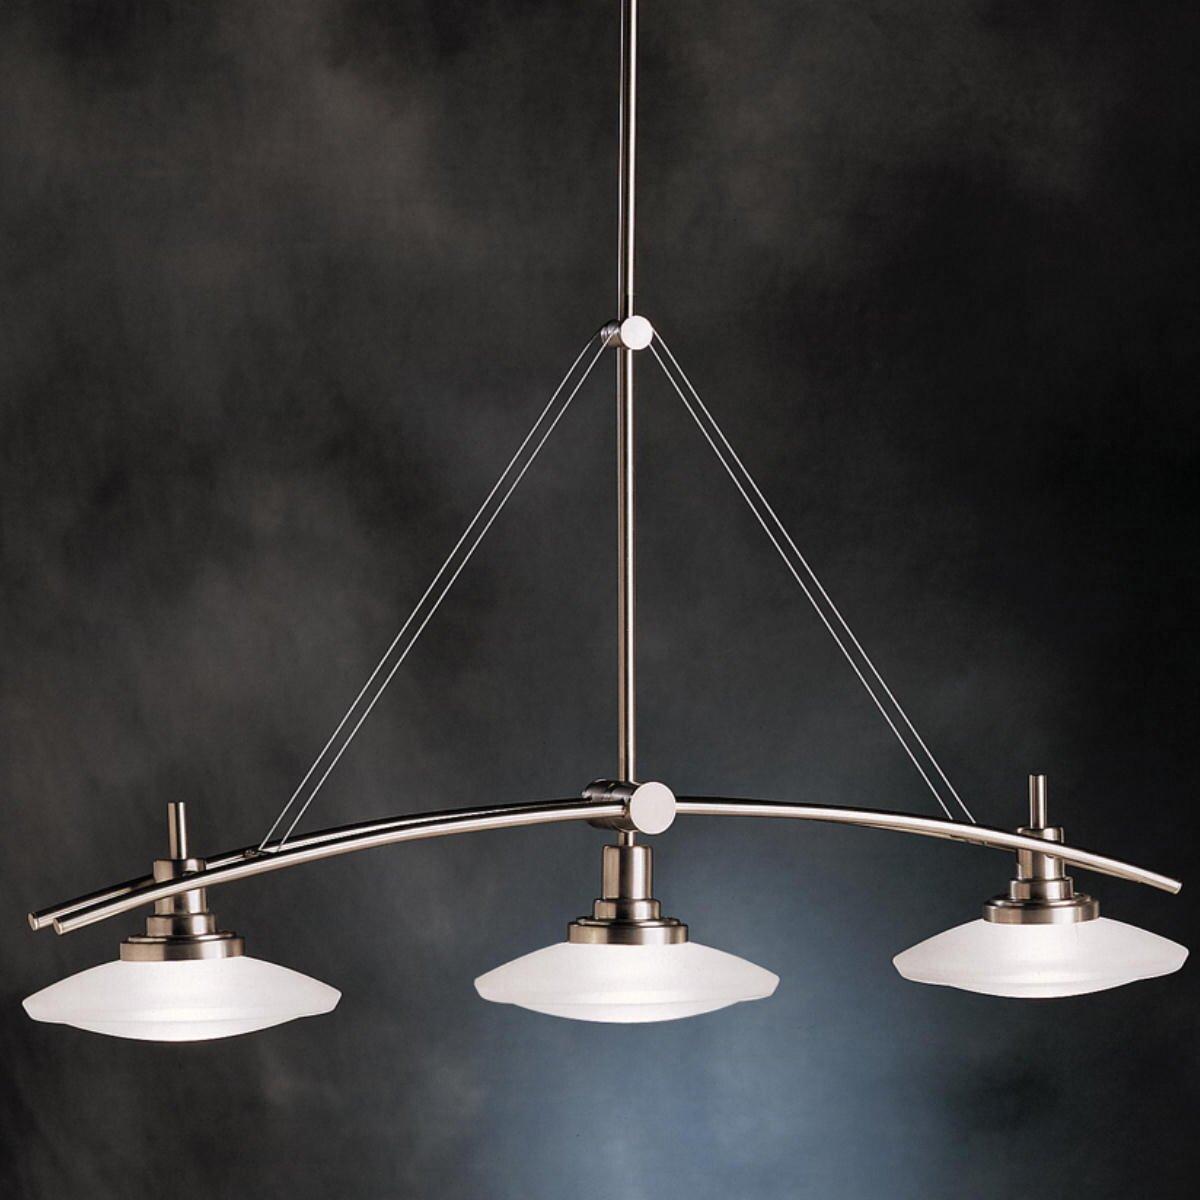 Kichler Lighting Reviews: Kichler Structures 3 Light Island Light & Reviews